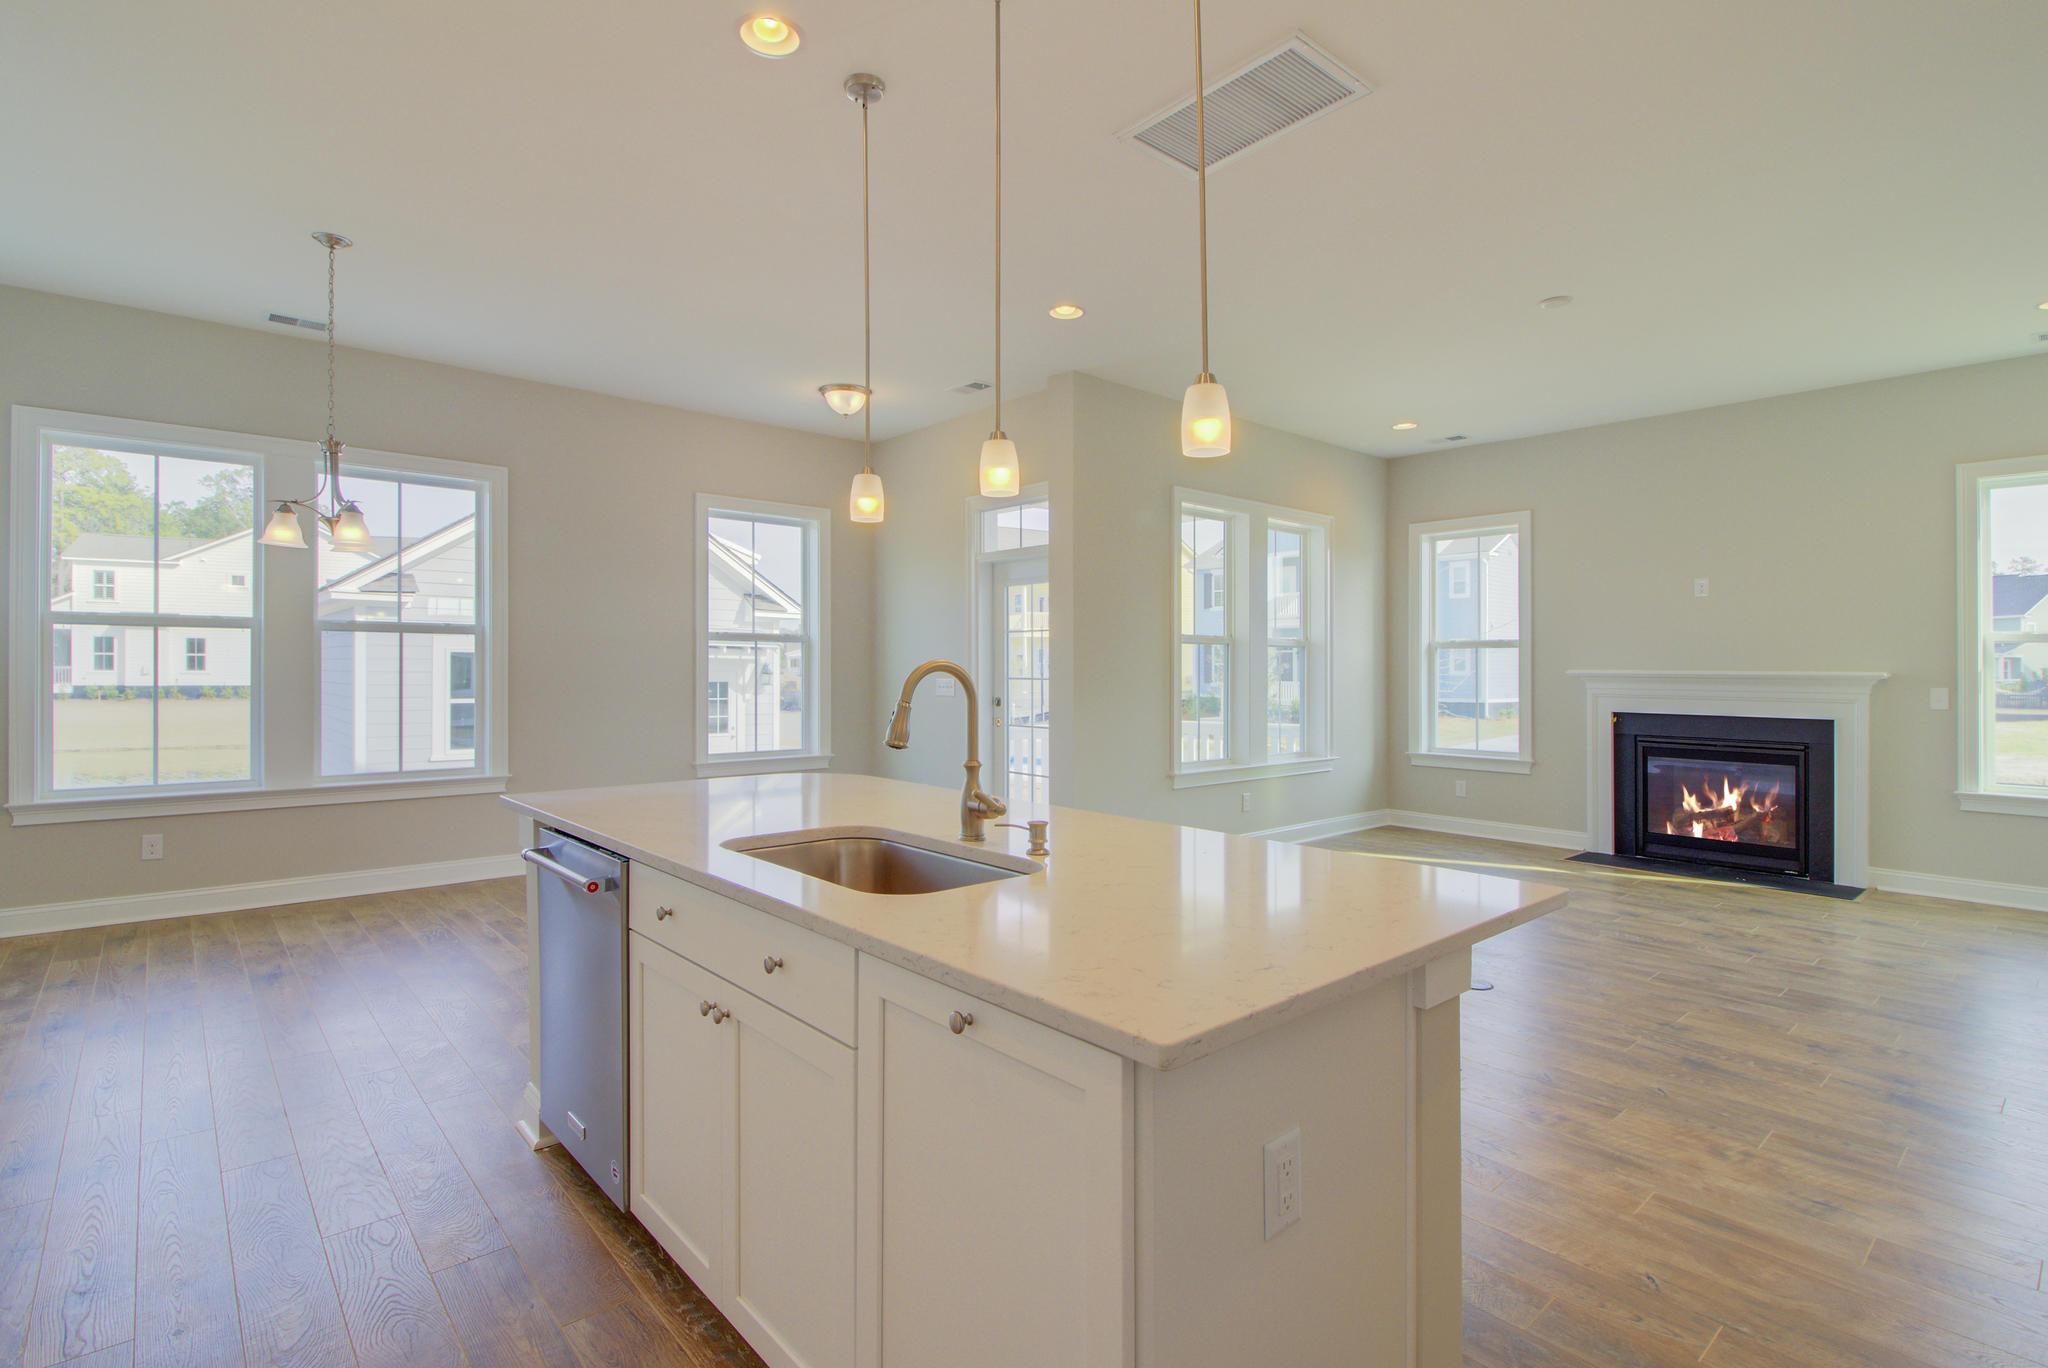 Carolina Park Homes For Sale - 1794 Sandybrook, Mount Pleasant, SC - 0